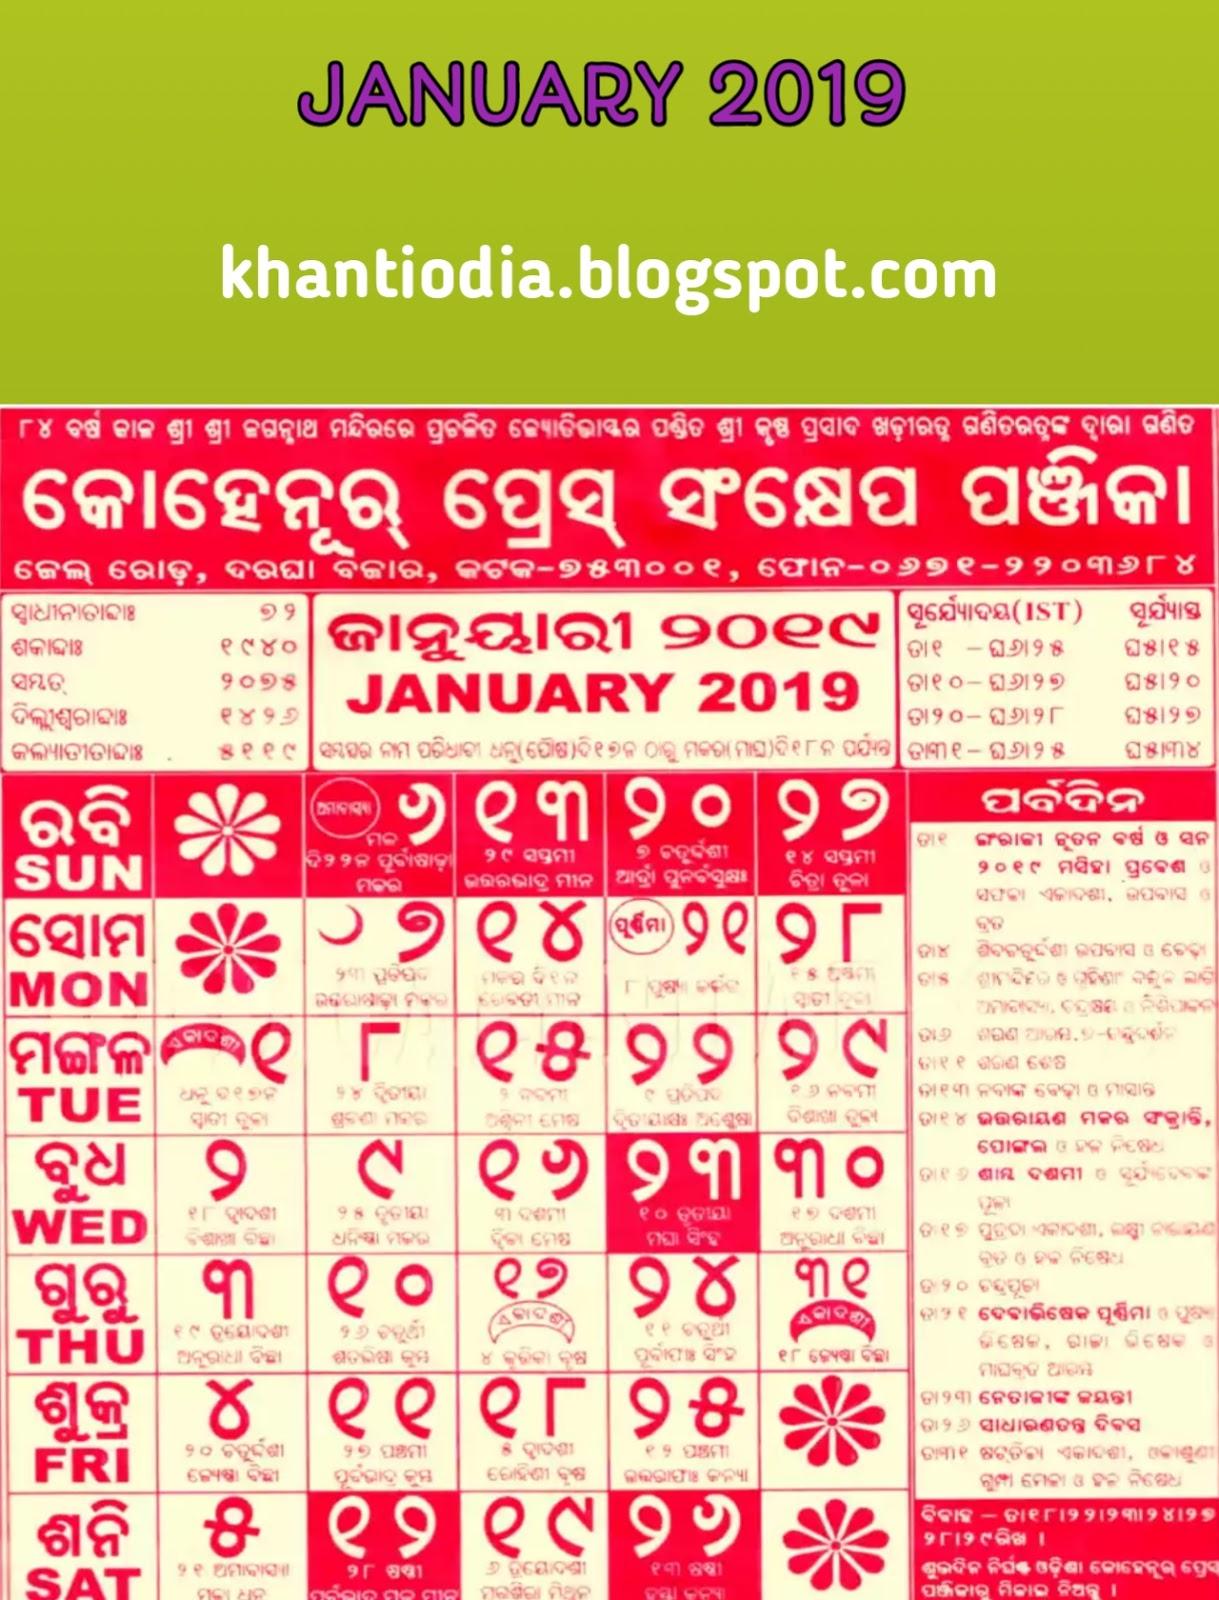 Odiya Calendar Kohinoor Press Sankhep Panjika 2019||Odiya regarding 1998 Calendar With Festivals